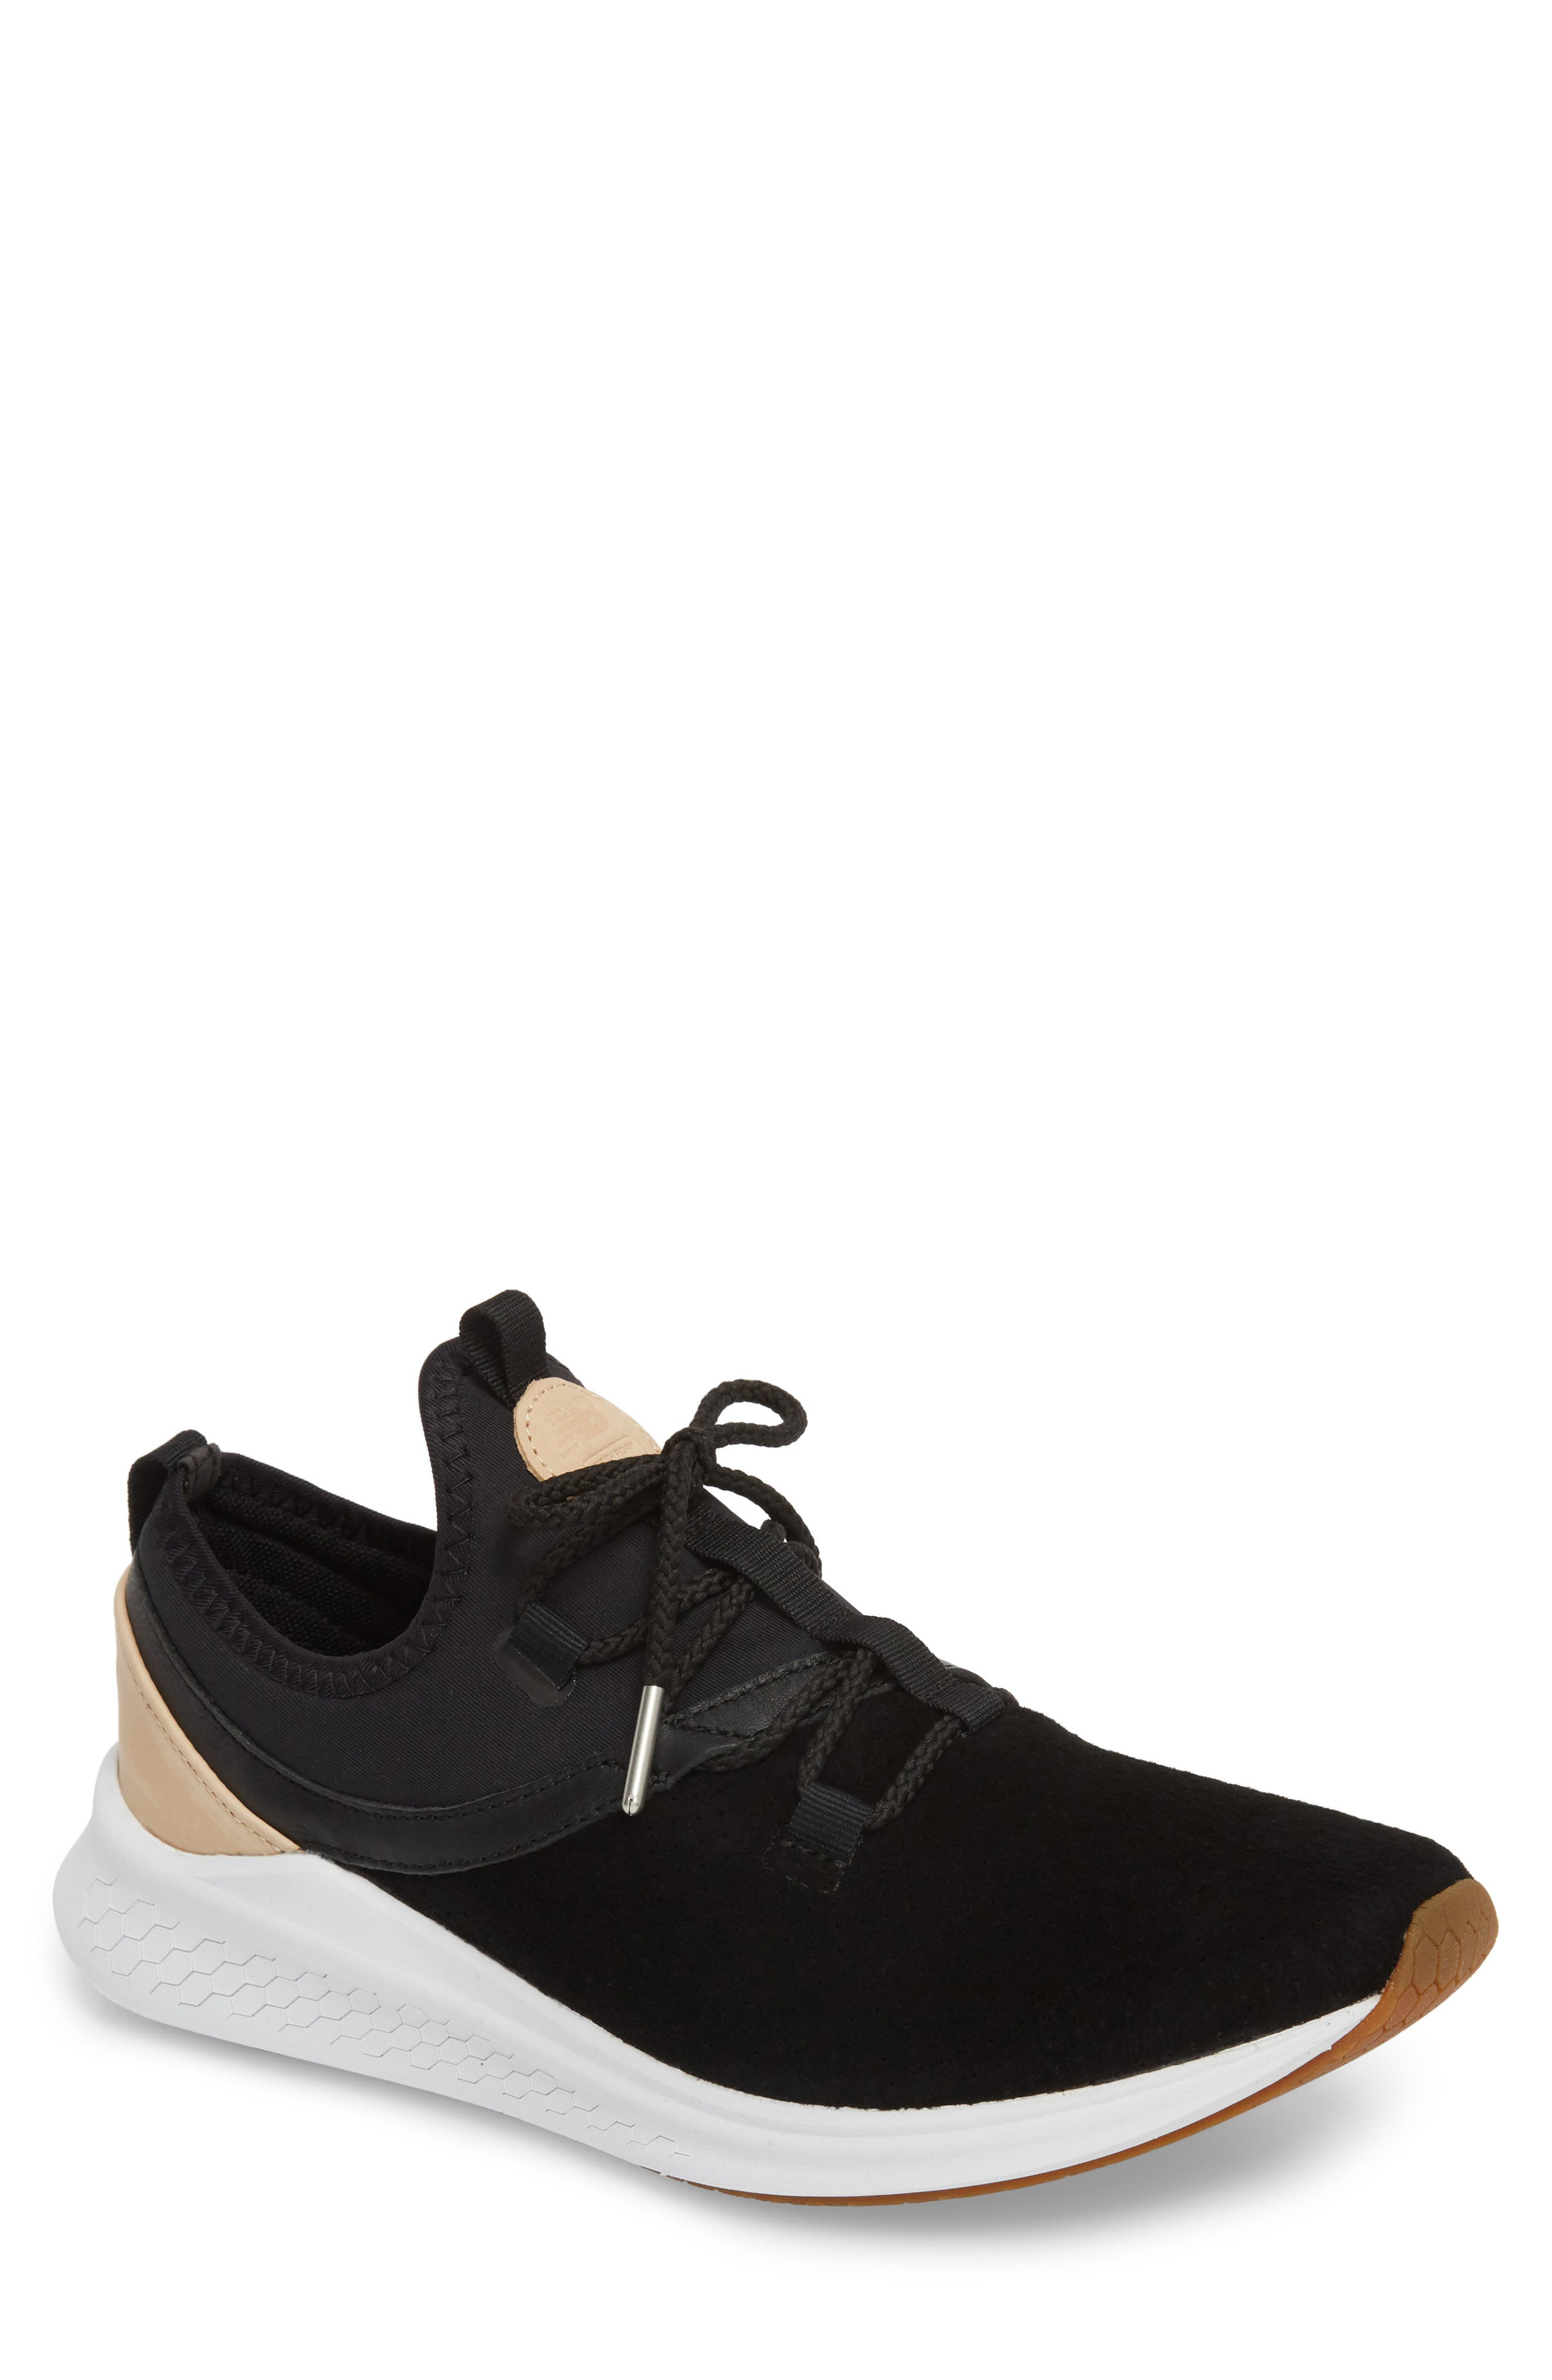 Fresh Foam Lazer Luxe Sneaker,                             Main thumbnail 1, color,                             Black